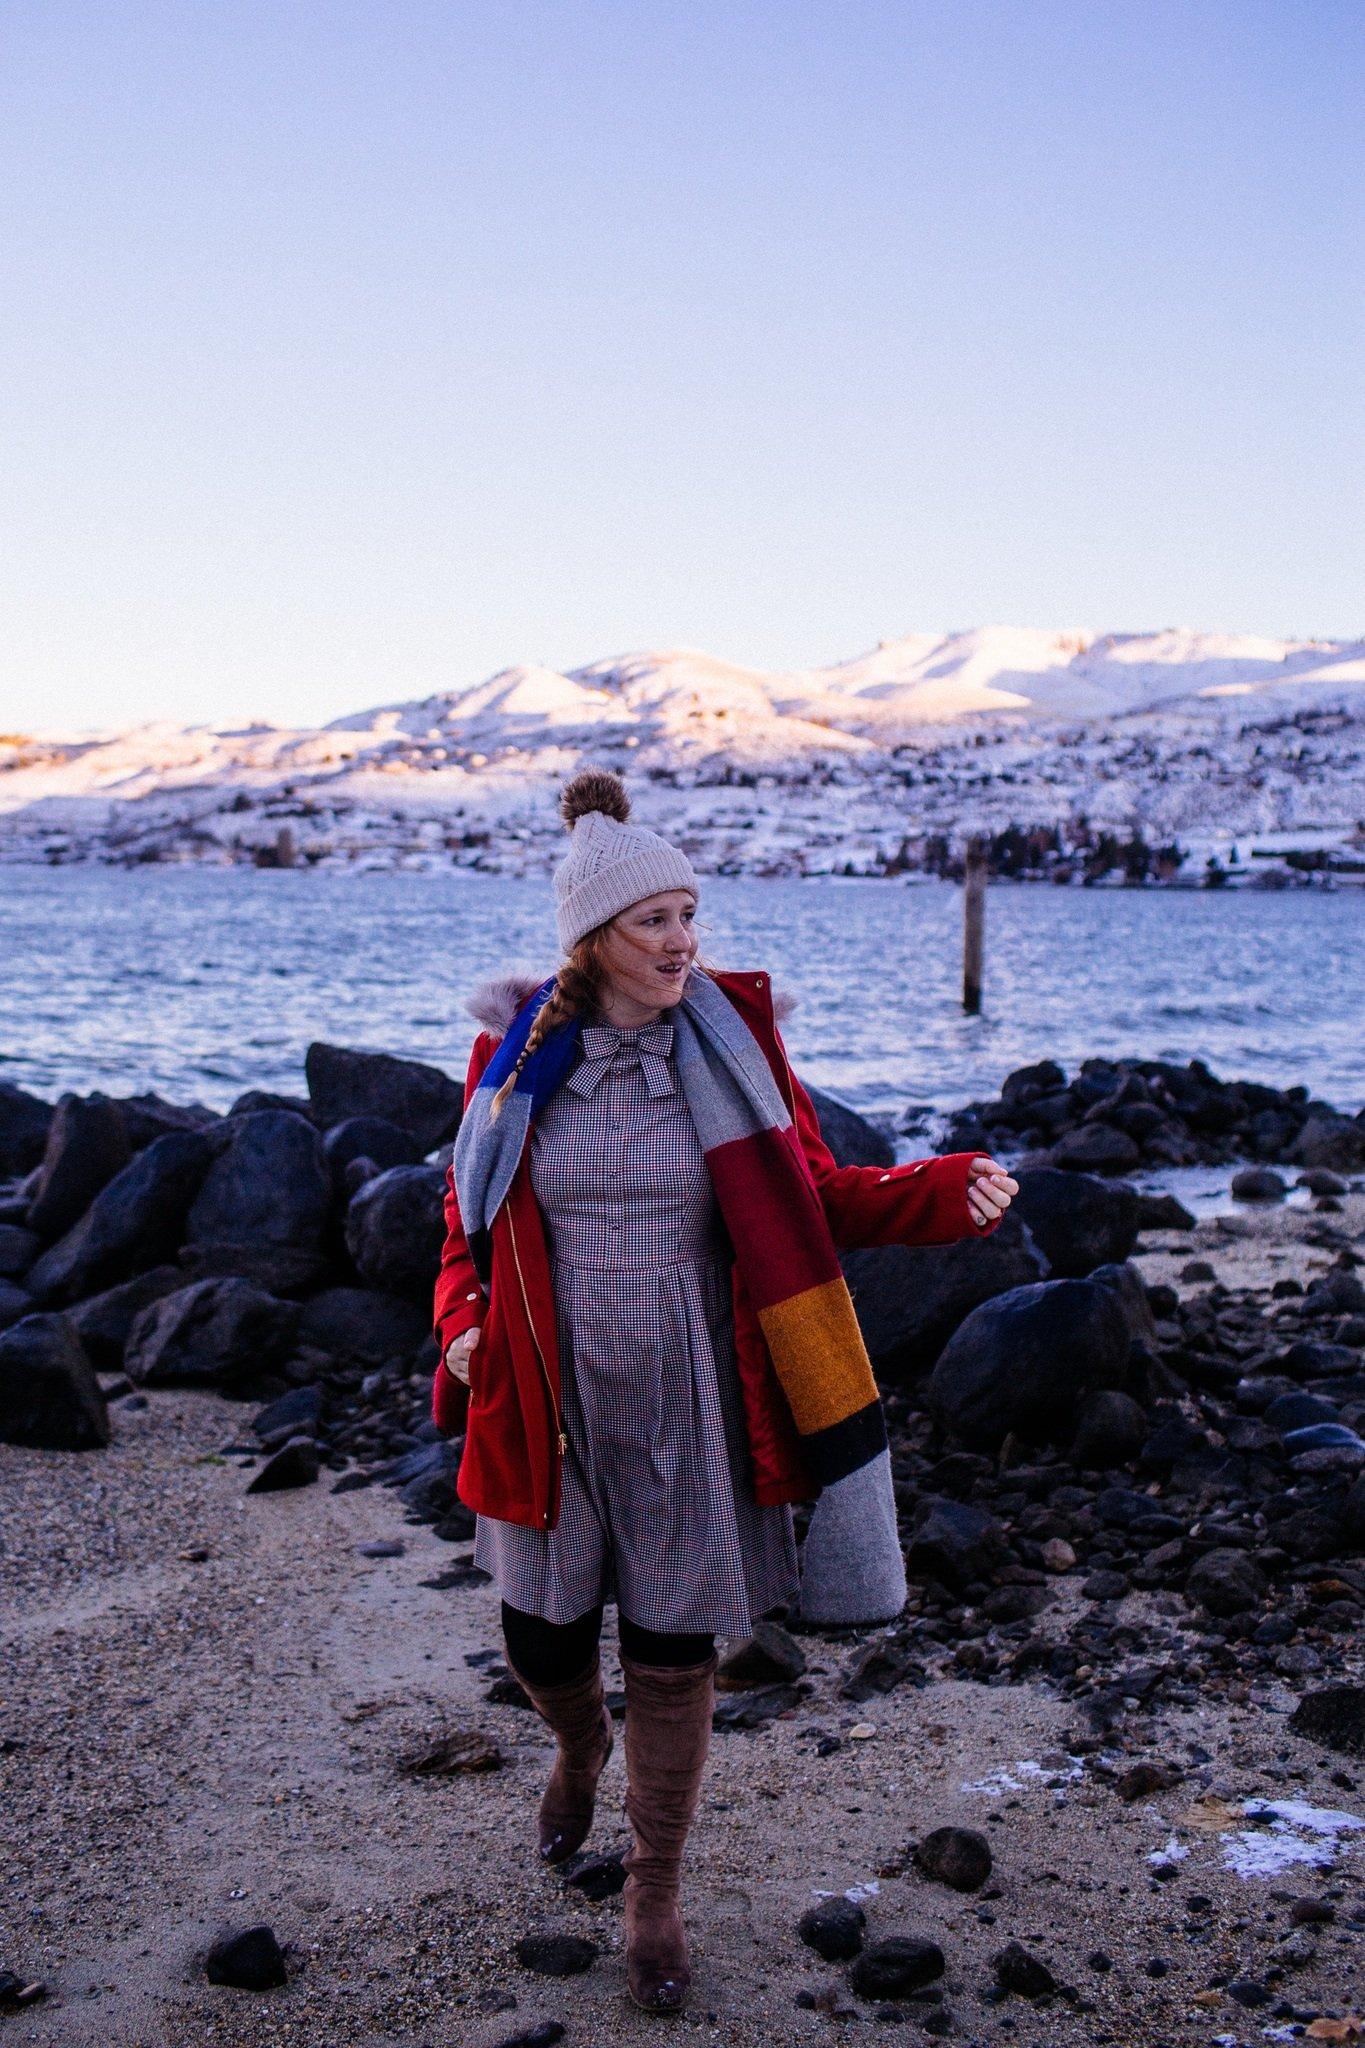 Woman at Lake Chelan